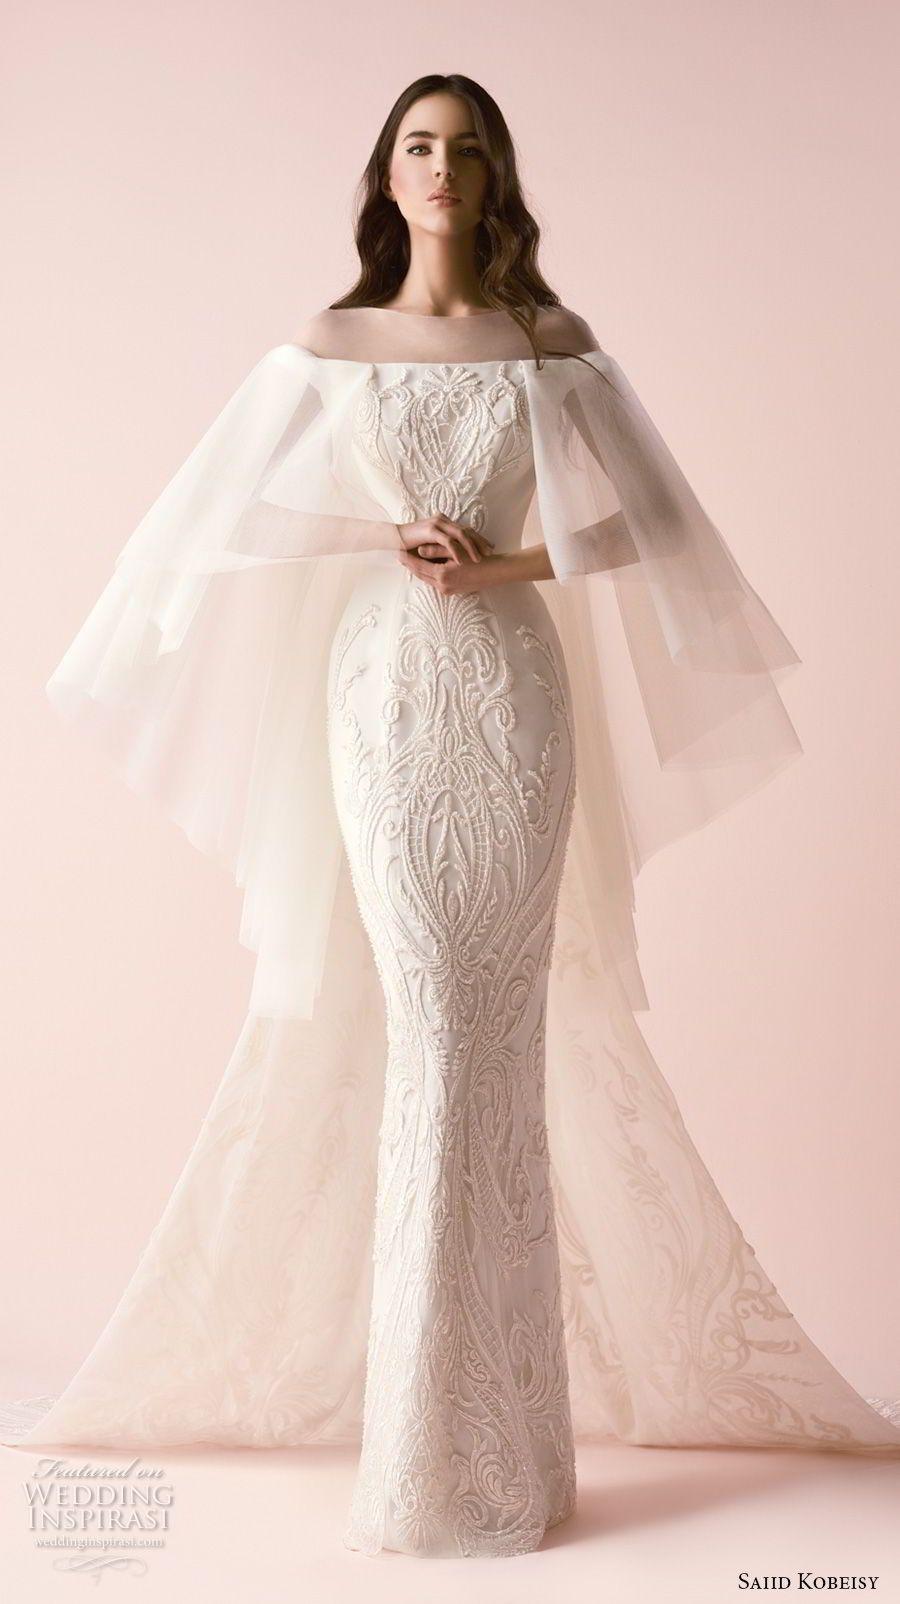 Wedding Elegant dresses tumblr